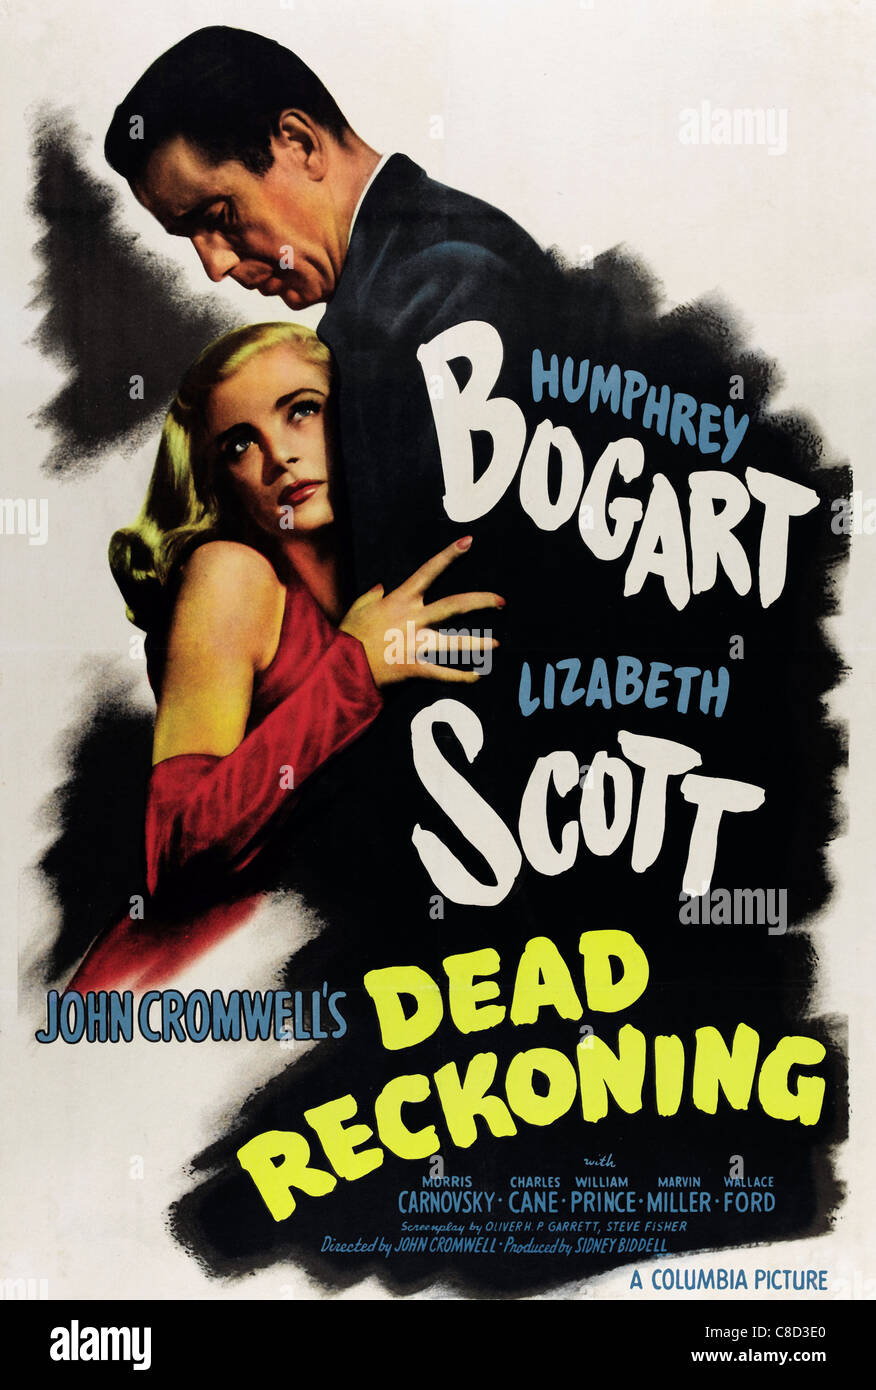 Lizabeth Scott poster